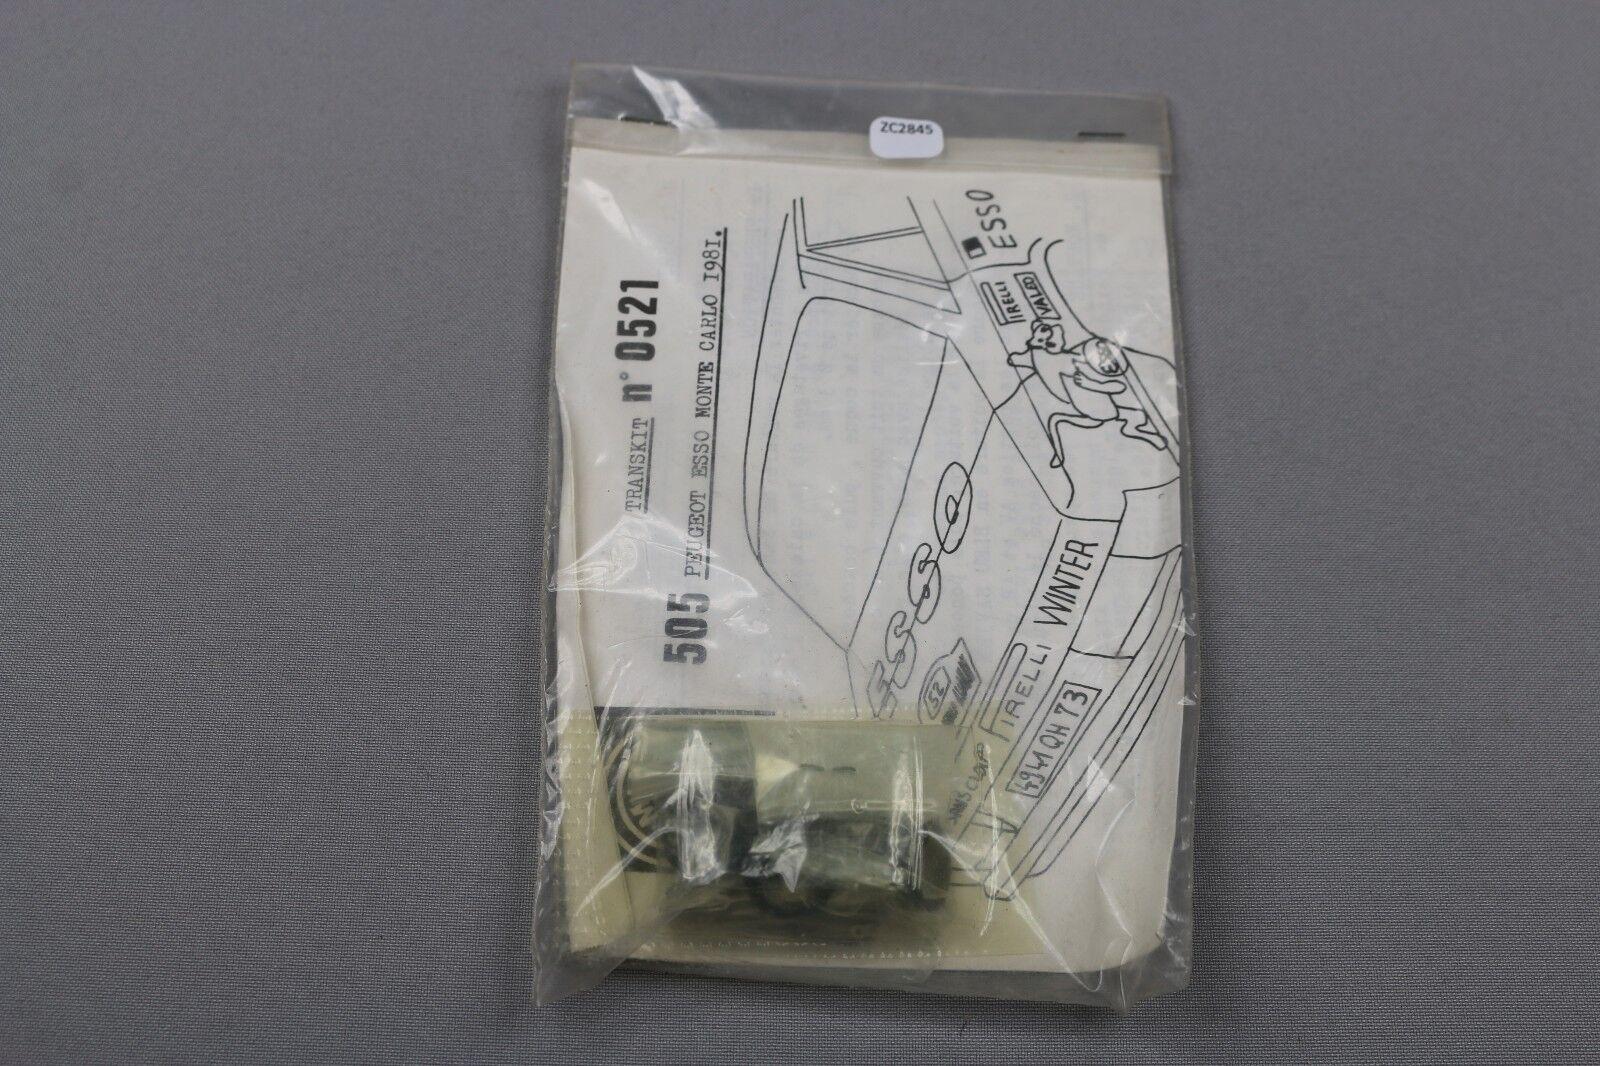 ZC2845 Mini Racing Racing Racing 1 43 voiture 0521 transkit peugeot 505 esso monte carlo 1981 447aae